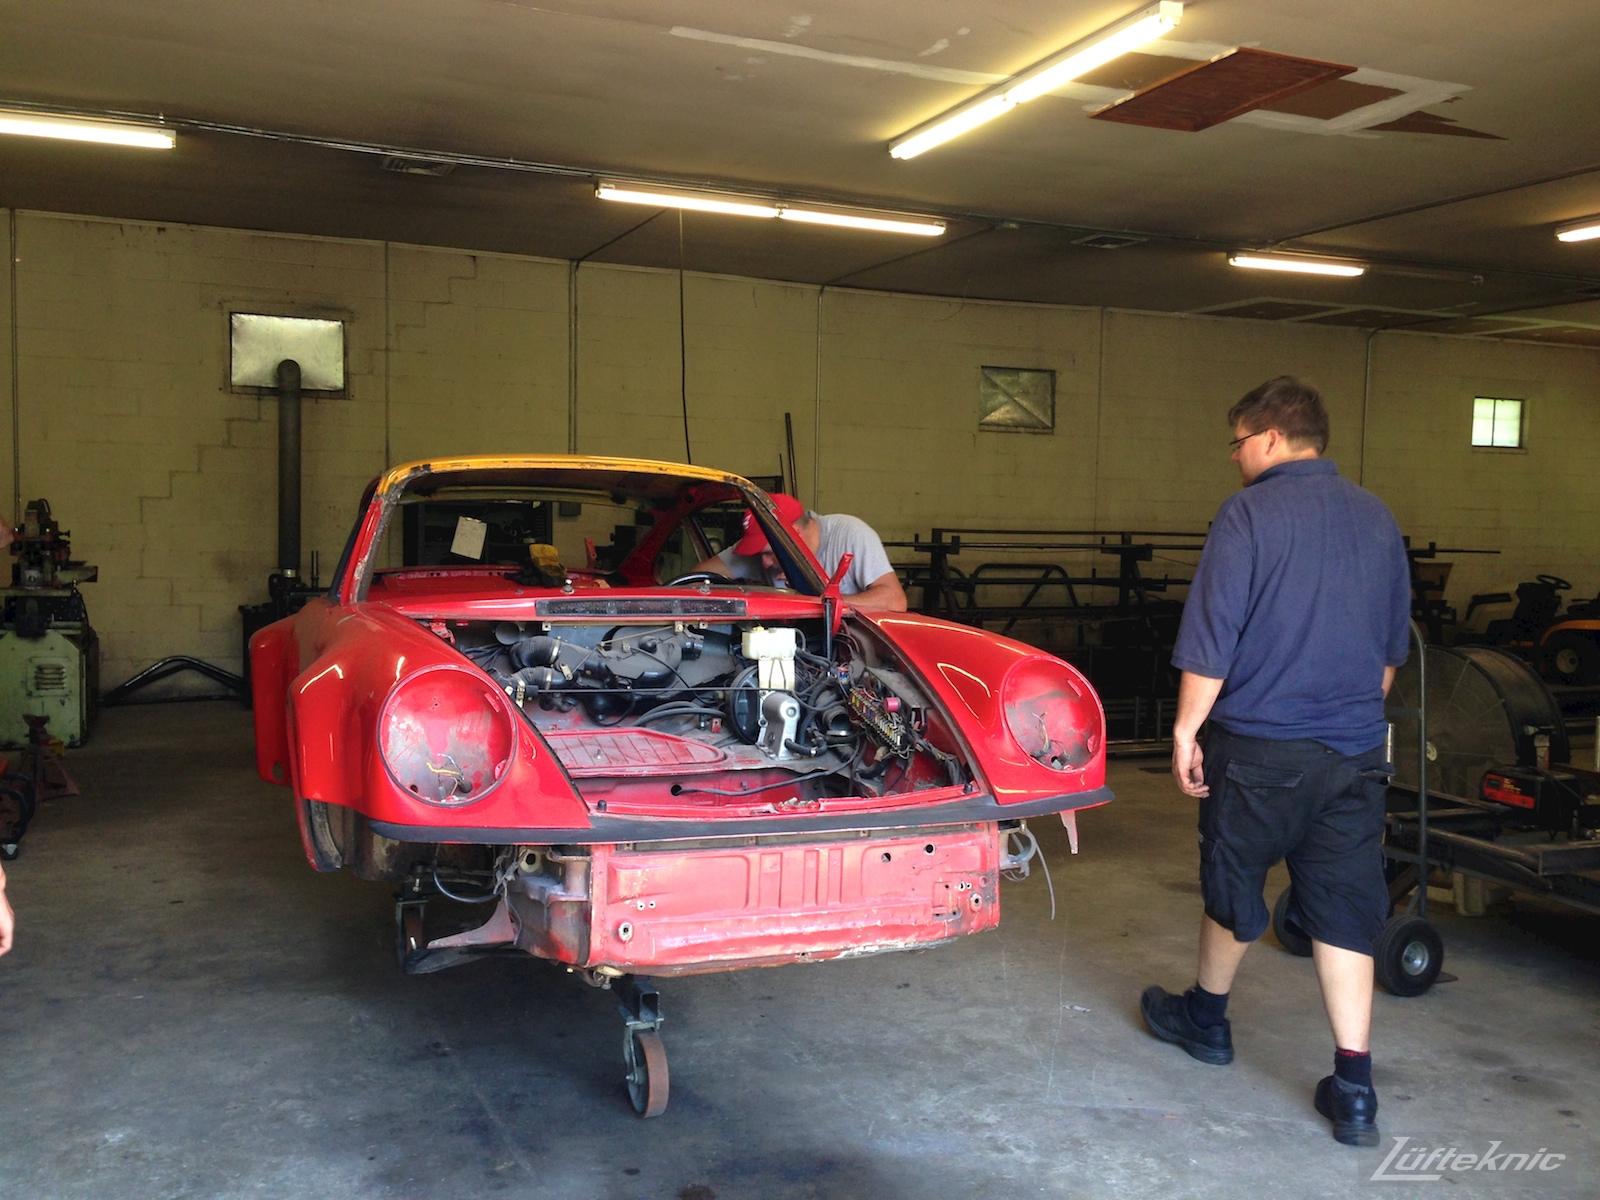 Lüfteknic #projectstuka Porsche 930 Turbo at the roll cage shop